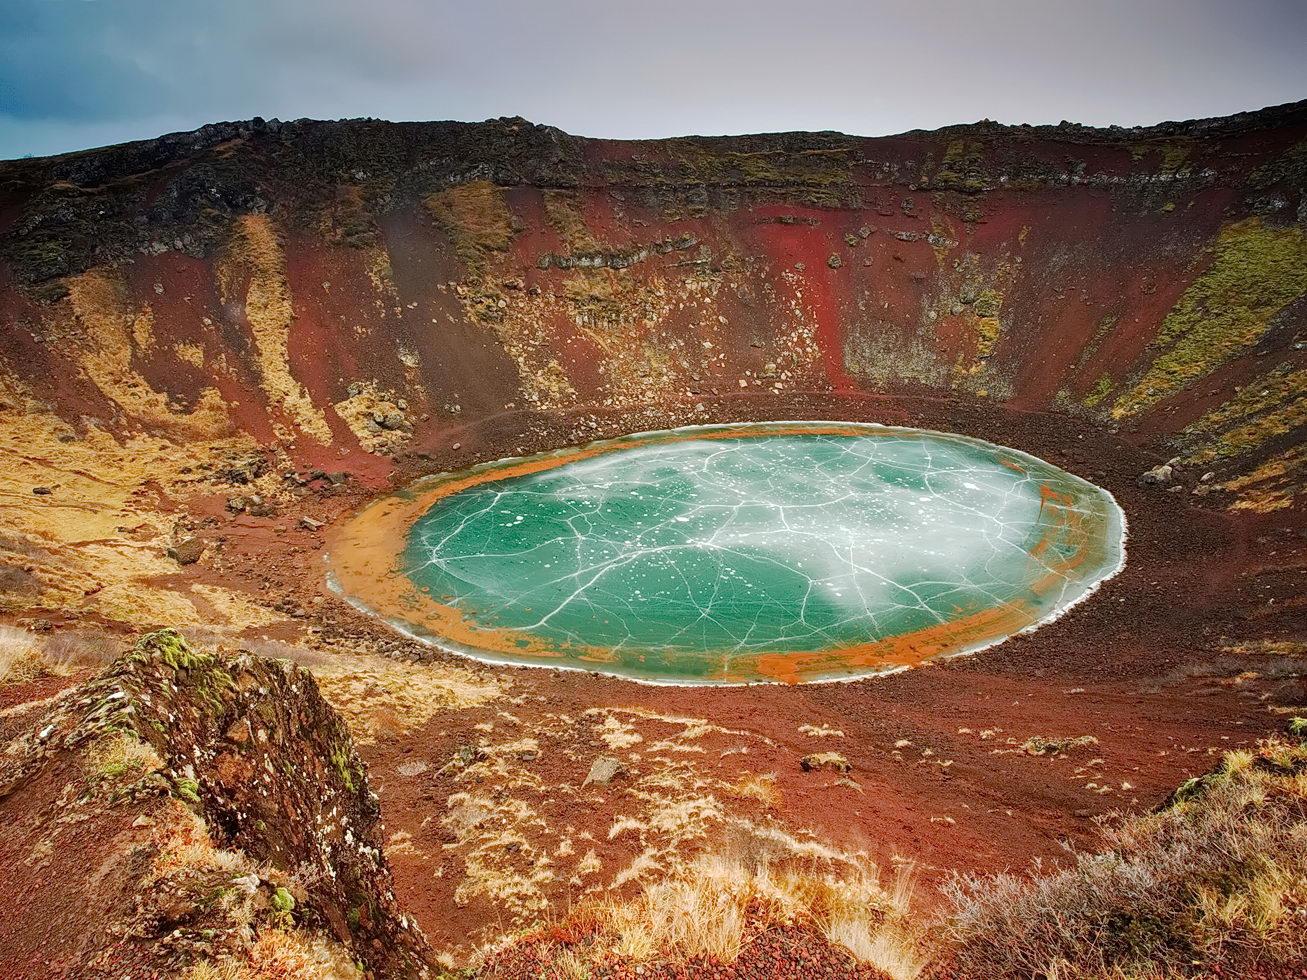 Метеоритные кратеры на земле фото